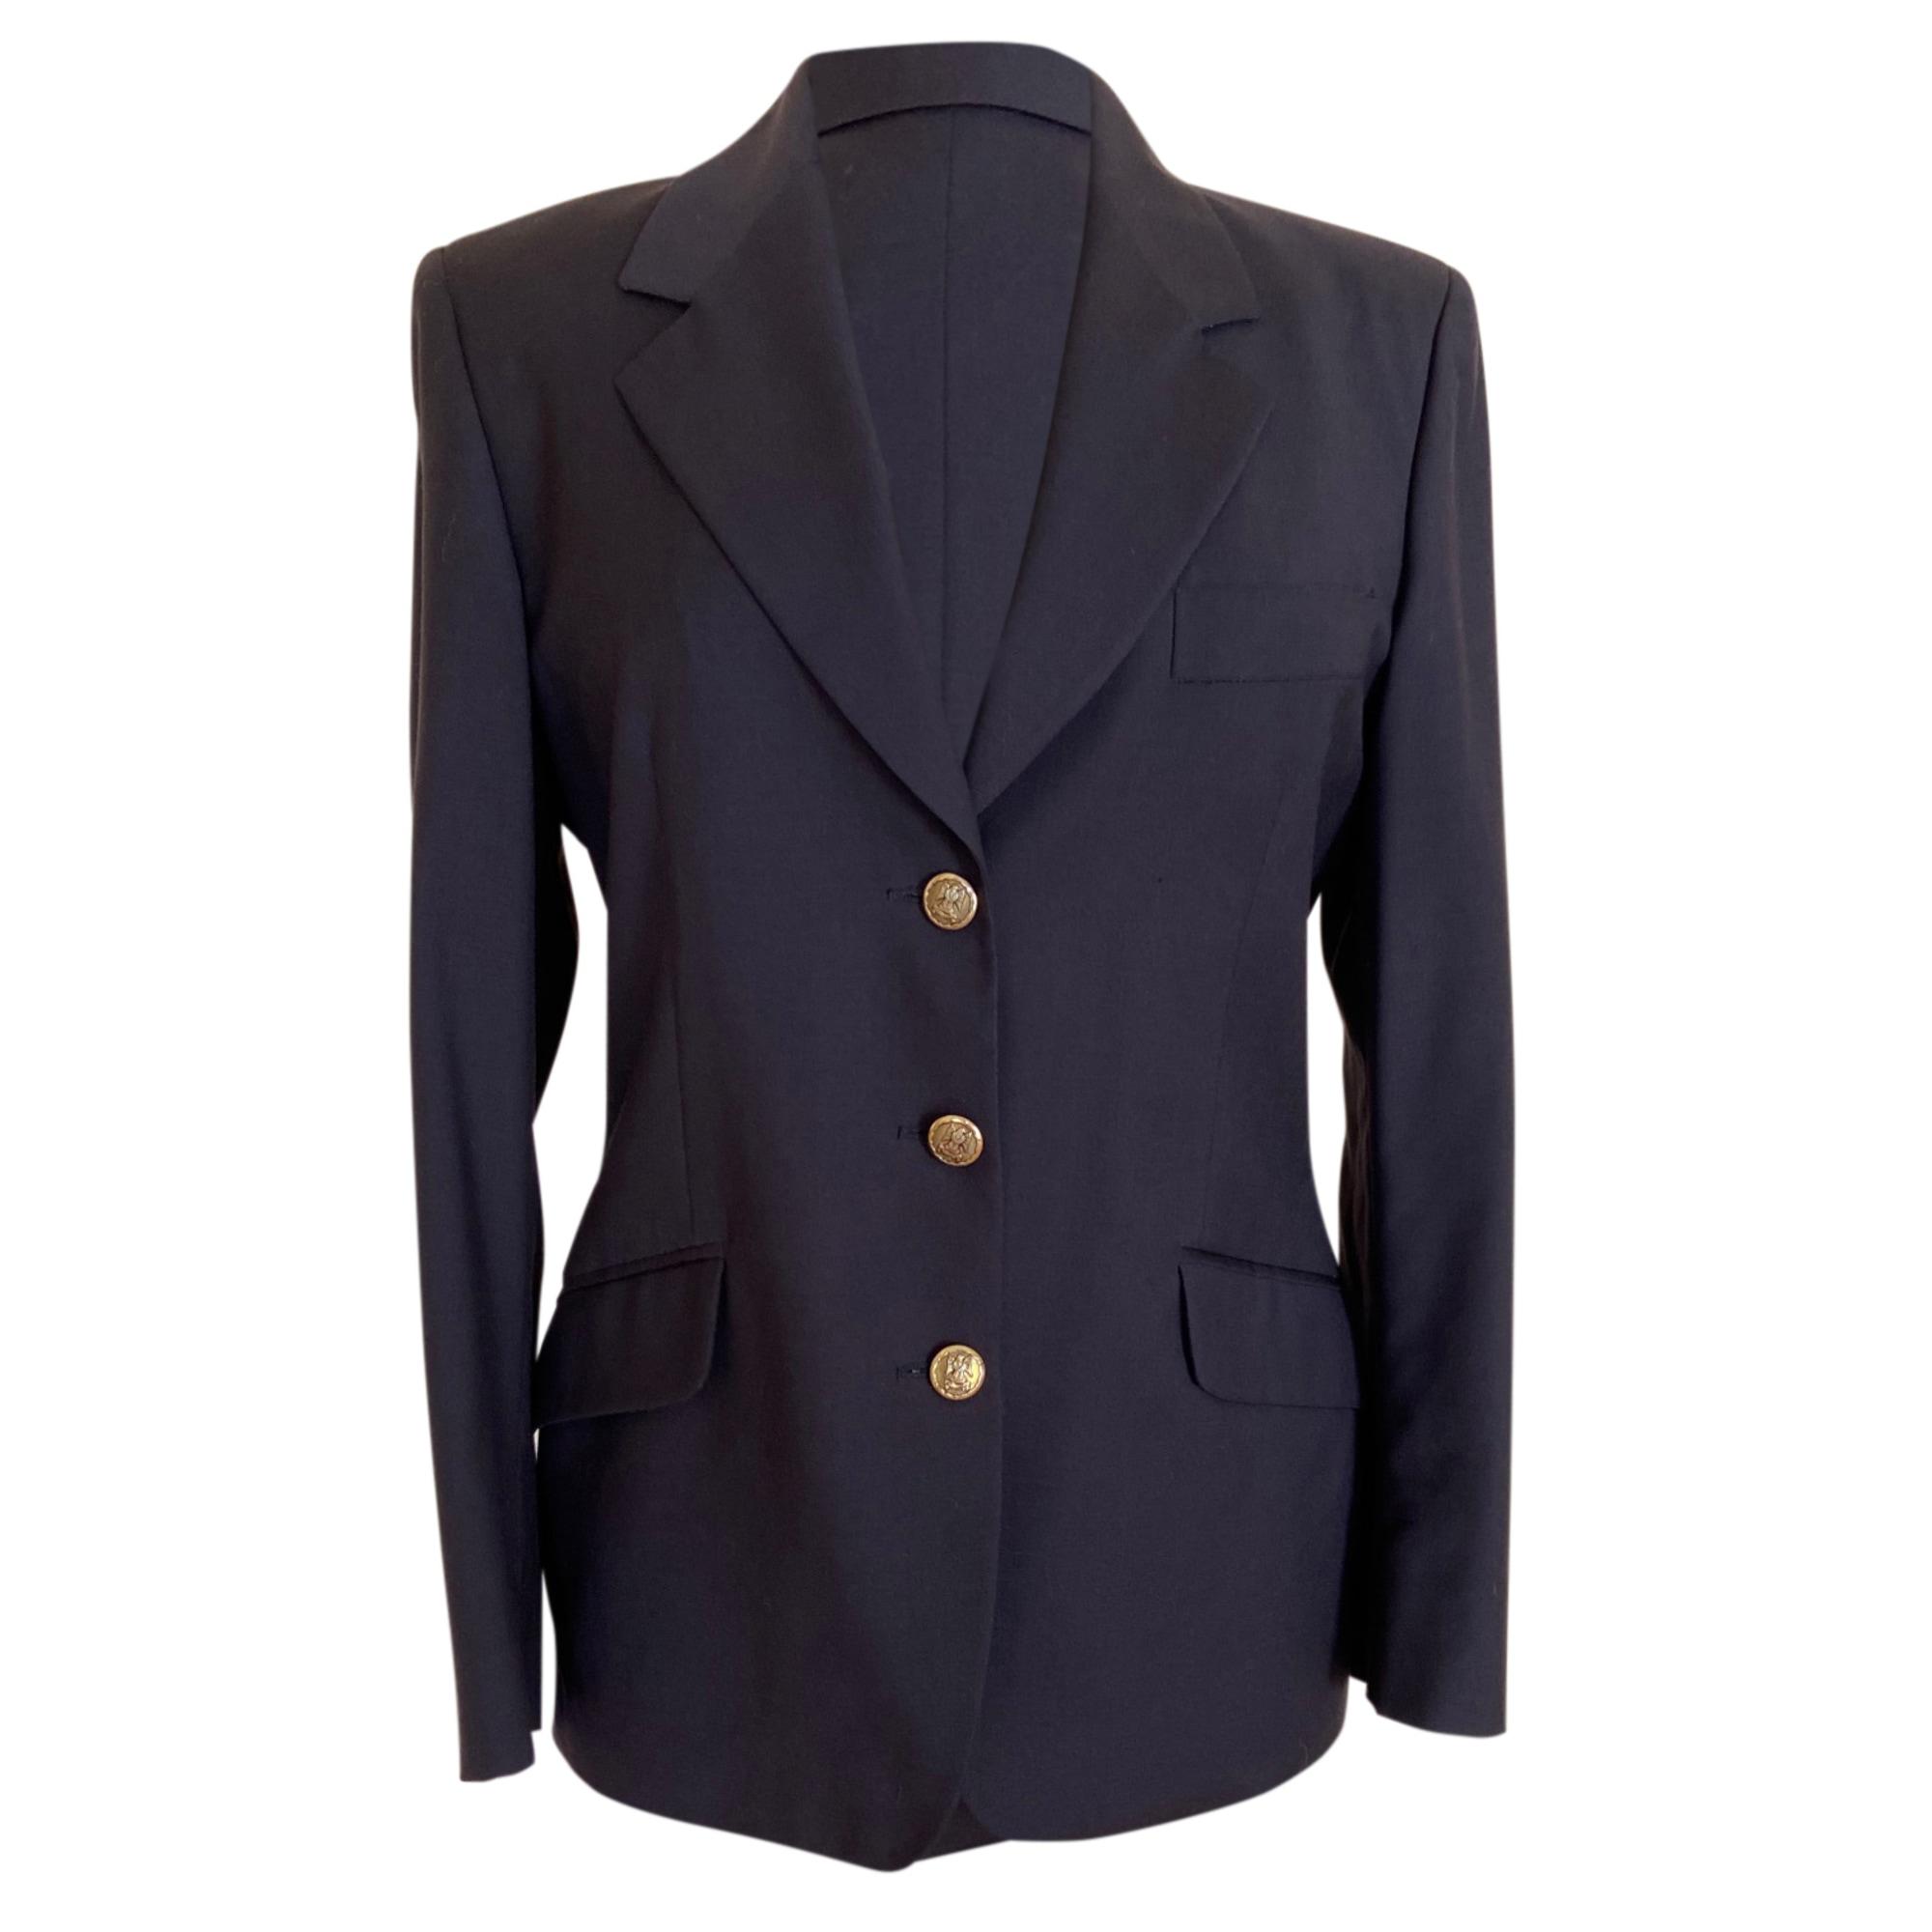 Blazer, veste tailleur HENRY COTTON'S Bleu, bleu marine, bleu turquoise